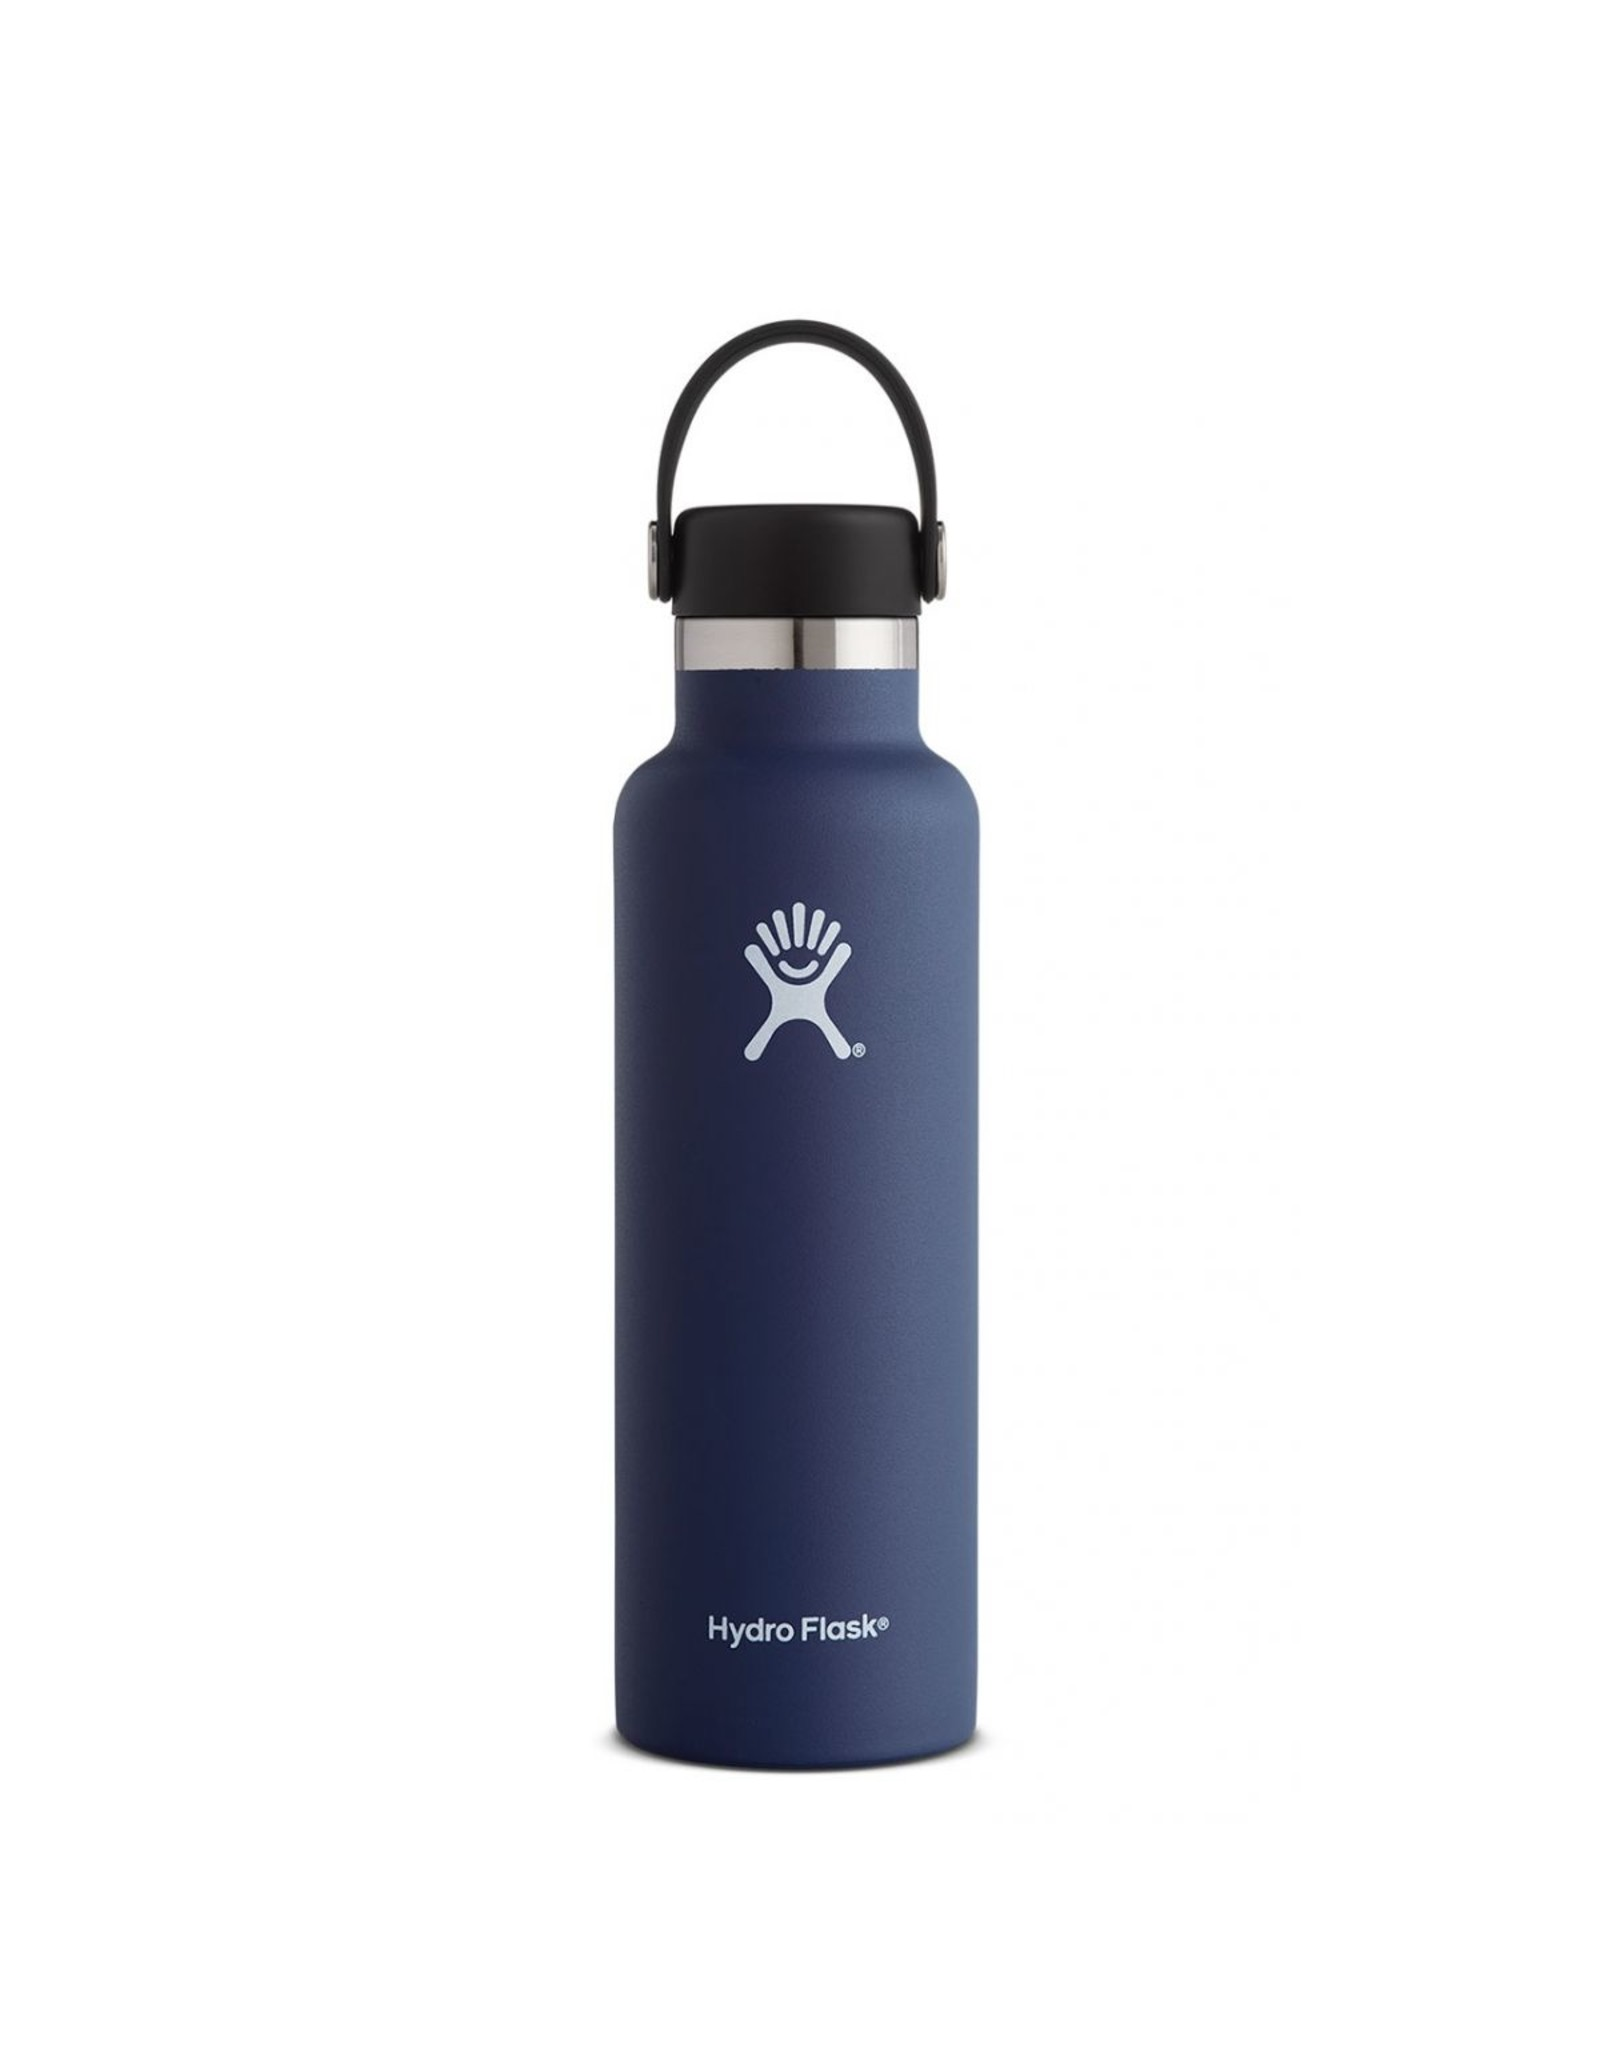 Hydro Flask Hydro Flask 21oz Standard Mouth Cobalt